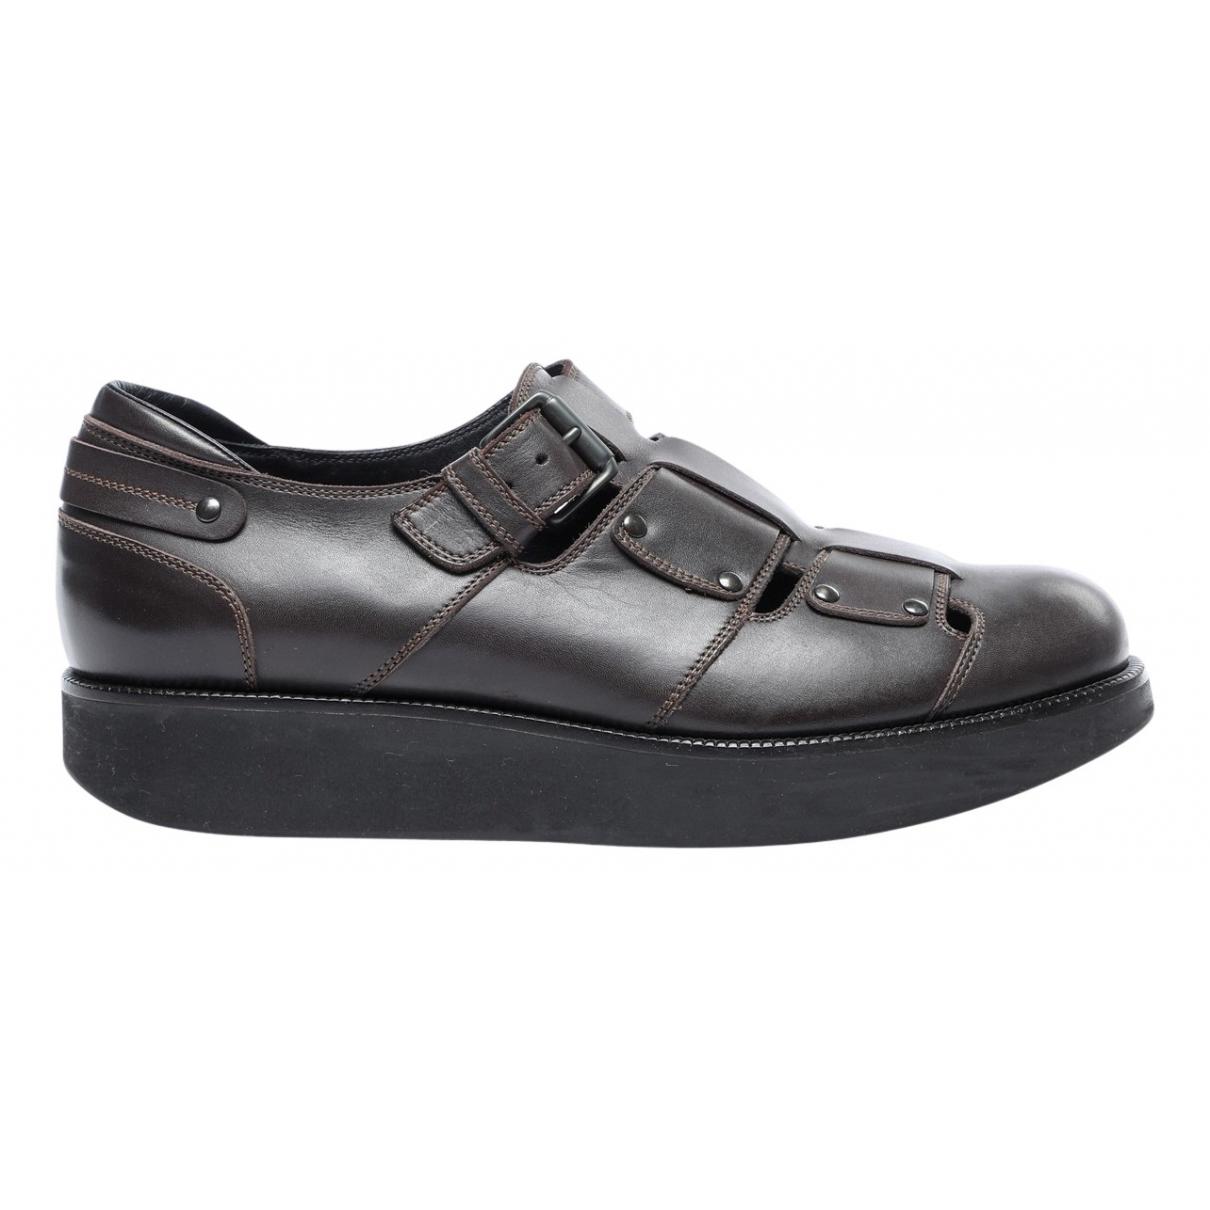 Bottega Veneta \N Brown Leather Flats for Men 43 EU